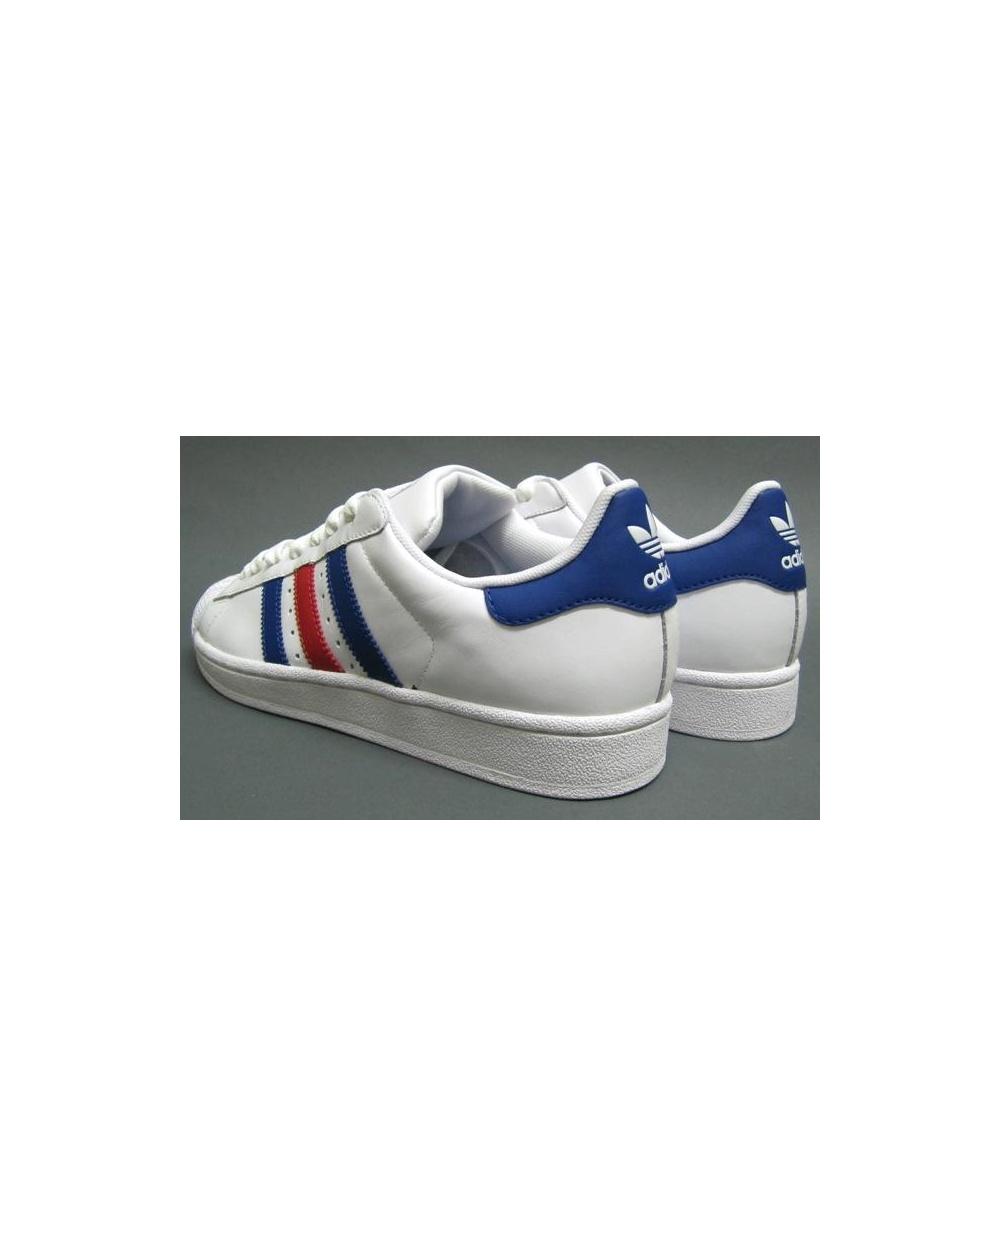 Adidas Superstar 2 Blå Striper IaKpKzAg